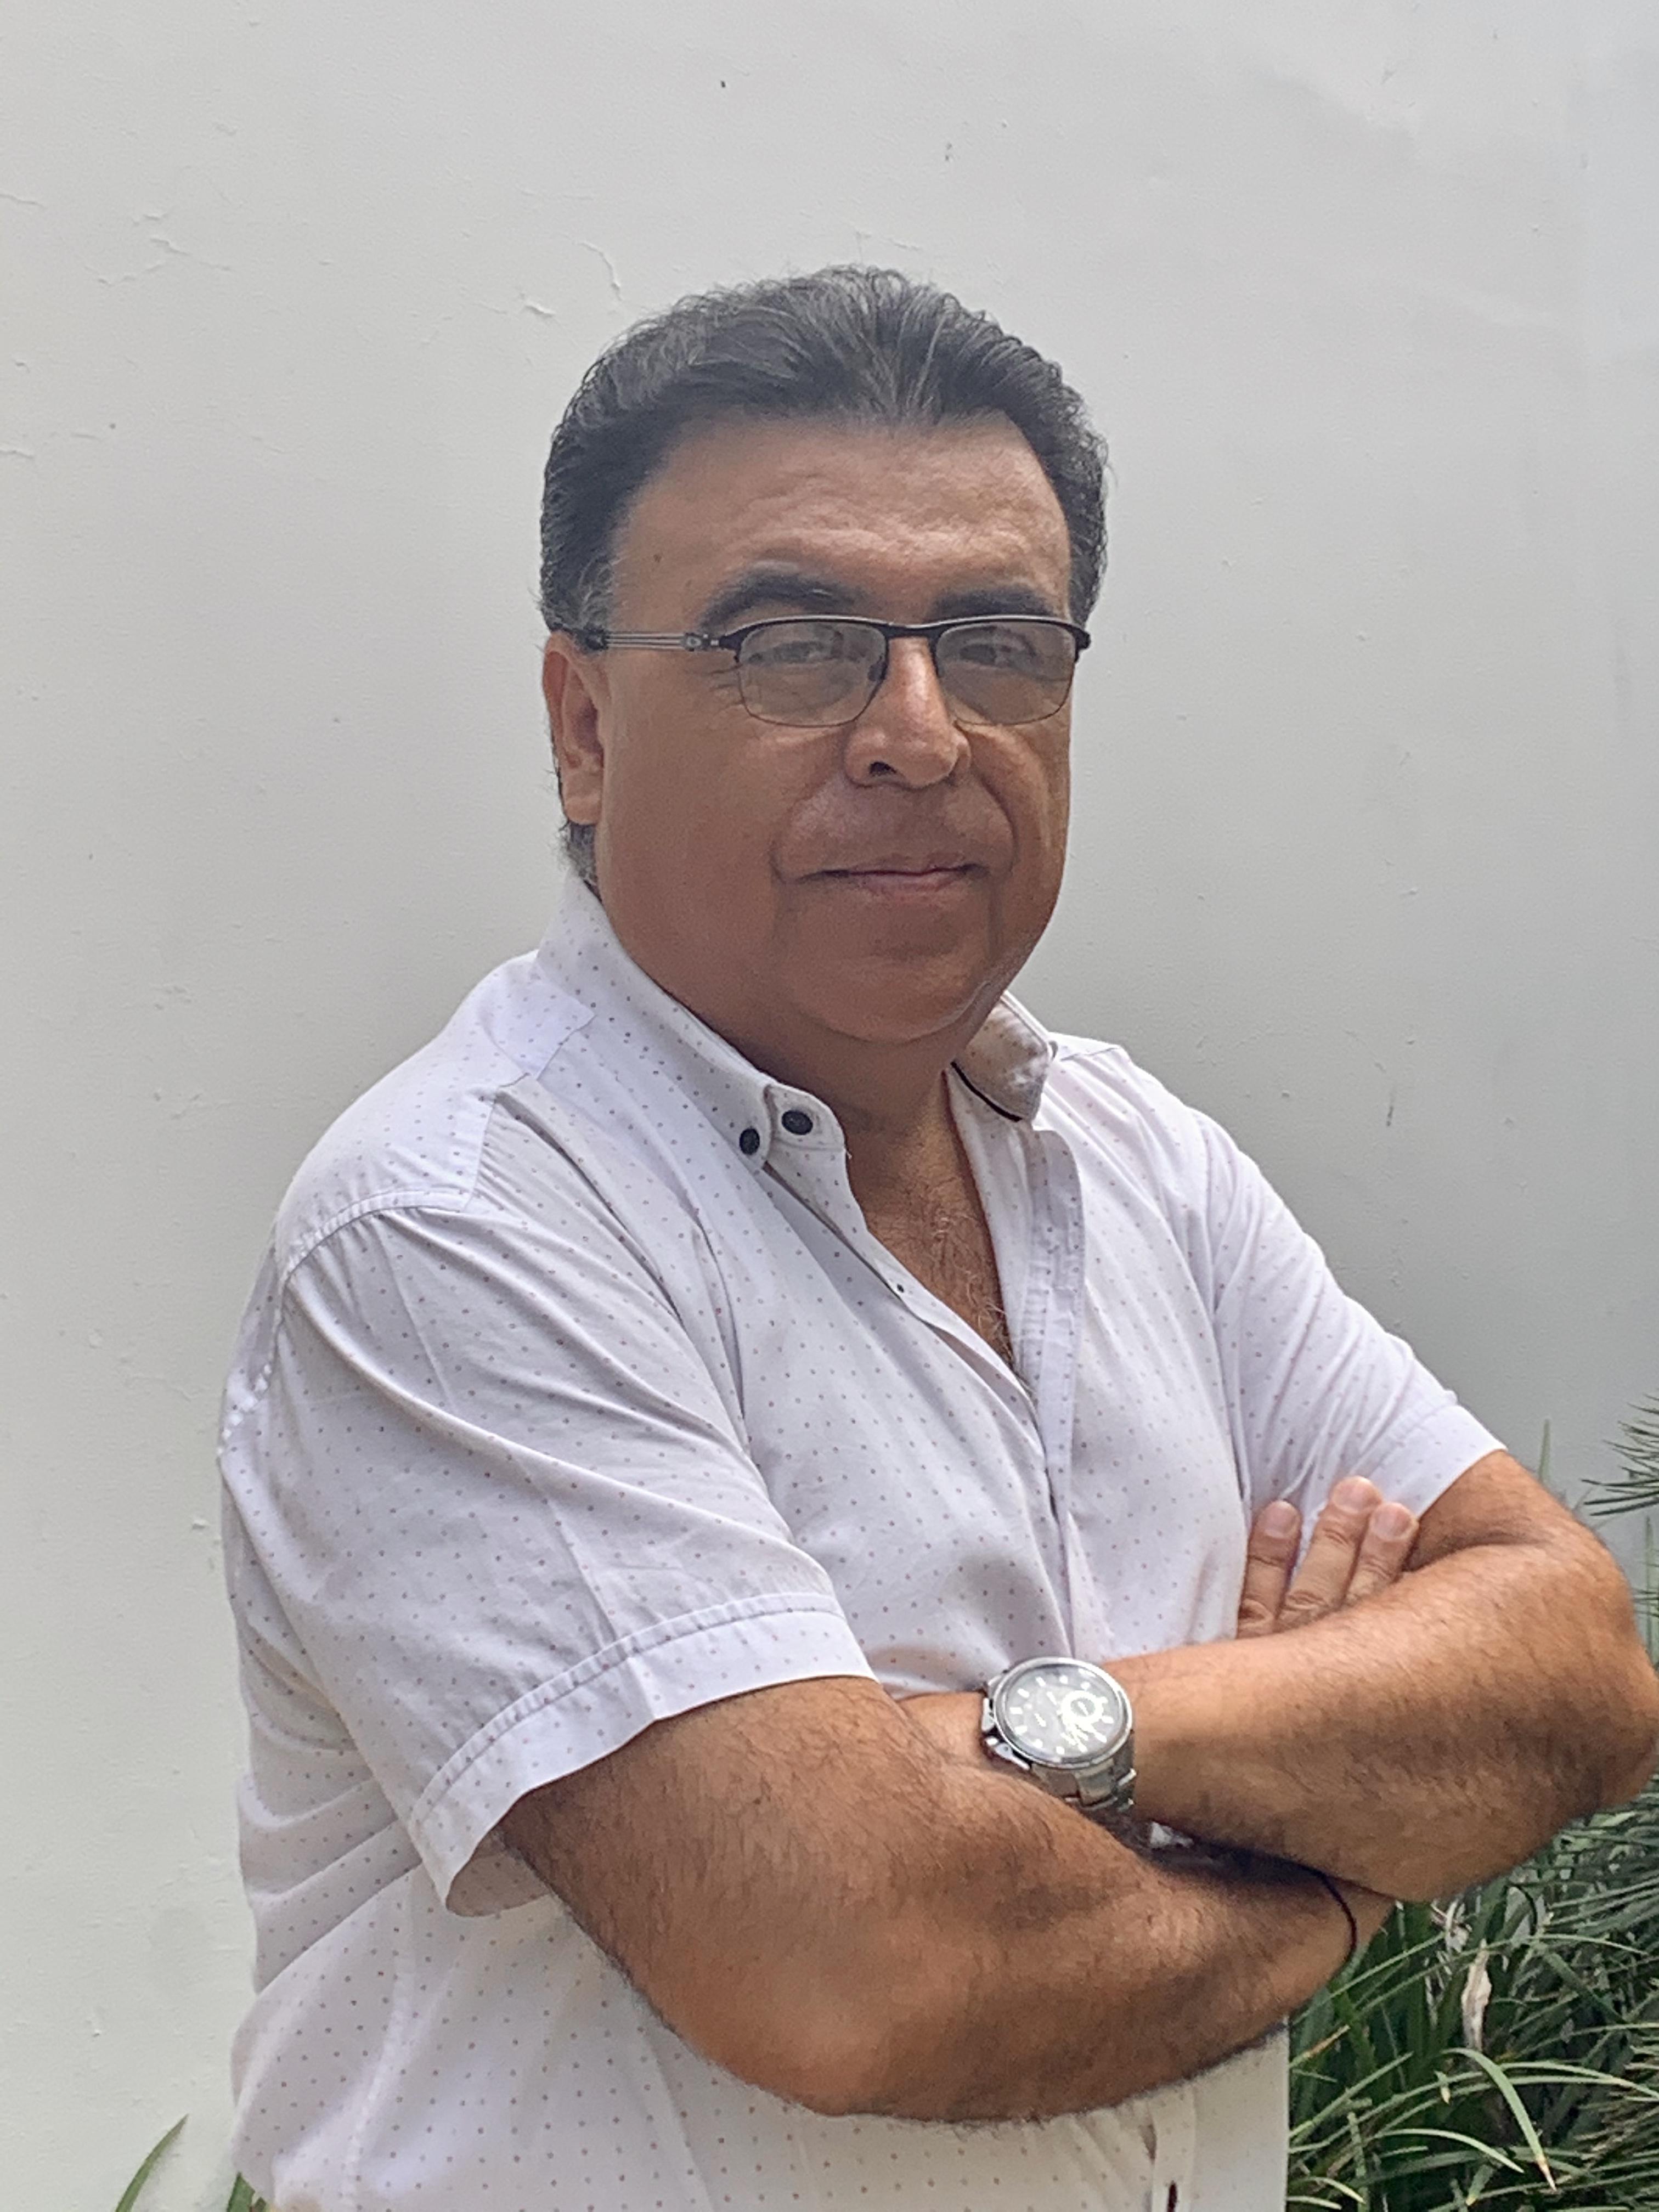 Percy Bobadilla Diaz